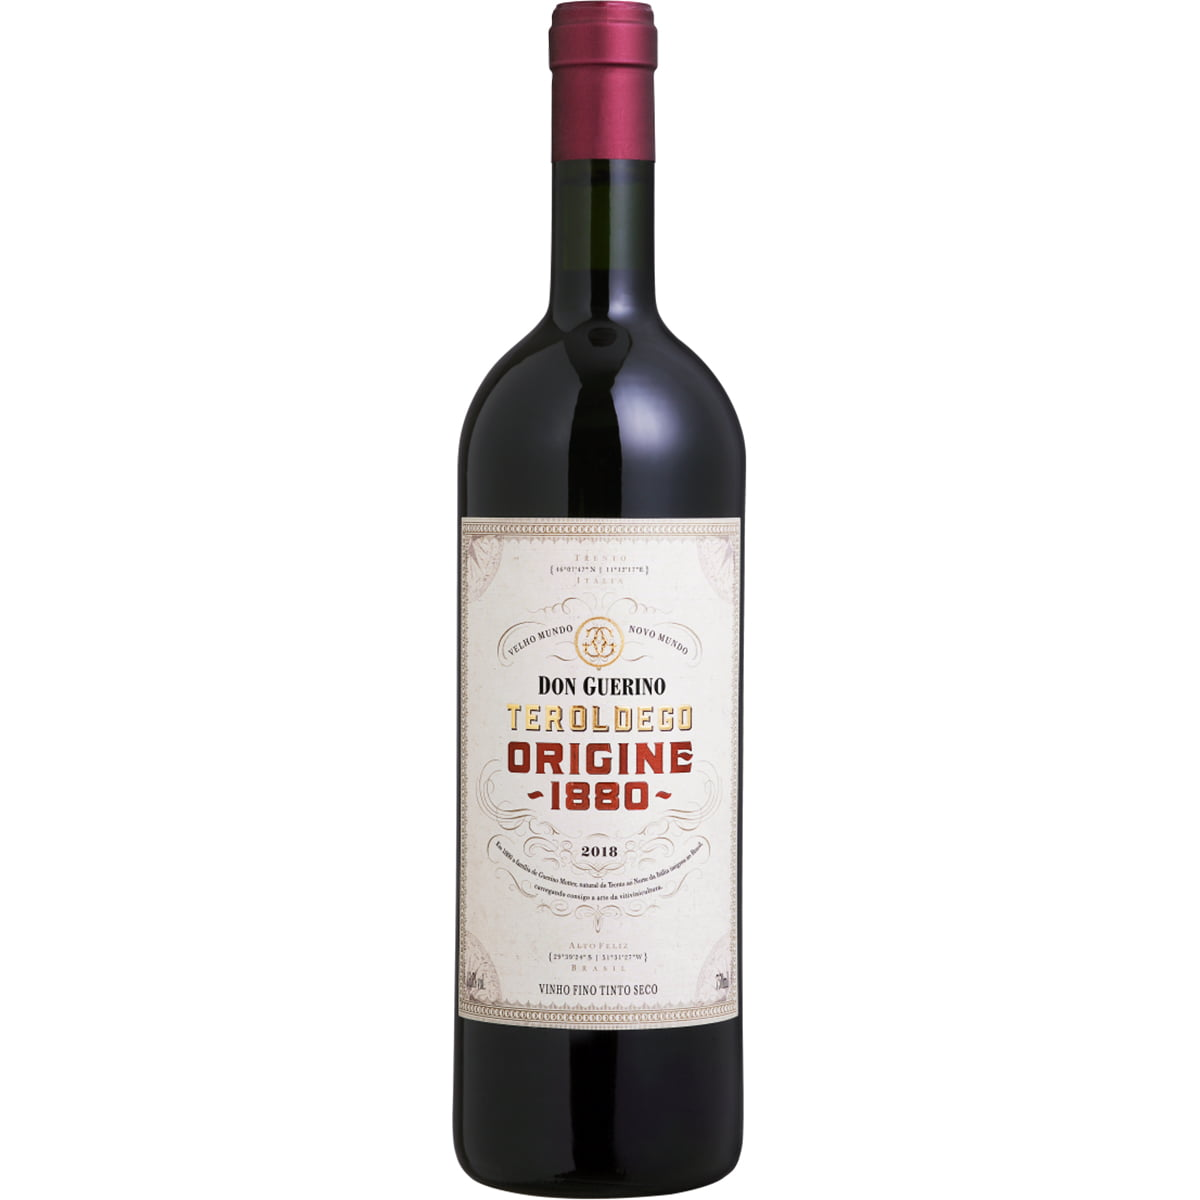 Vinho Don Guerino Reserva Teroldego Origine 1880 Tinto Seco 750ml